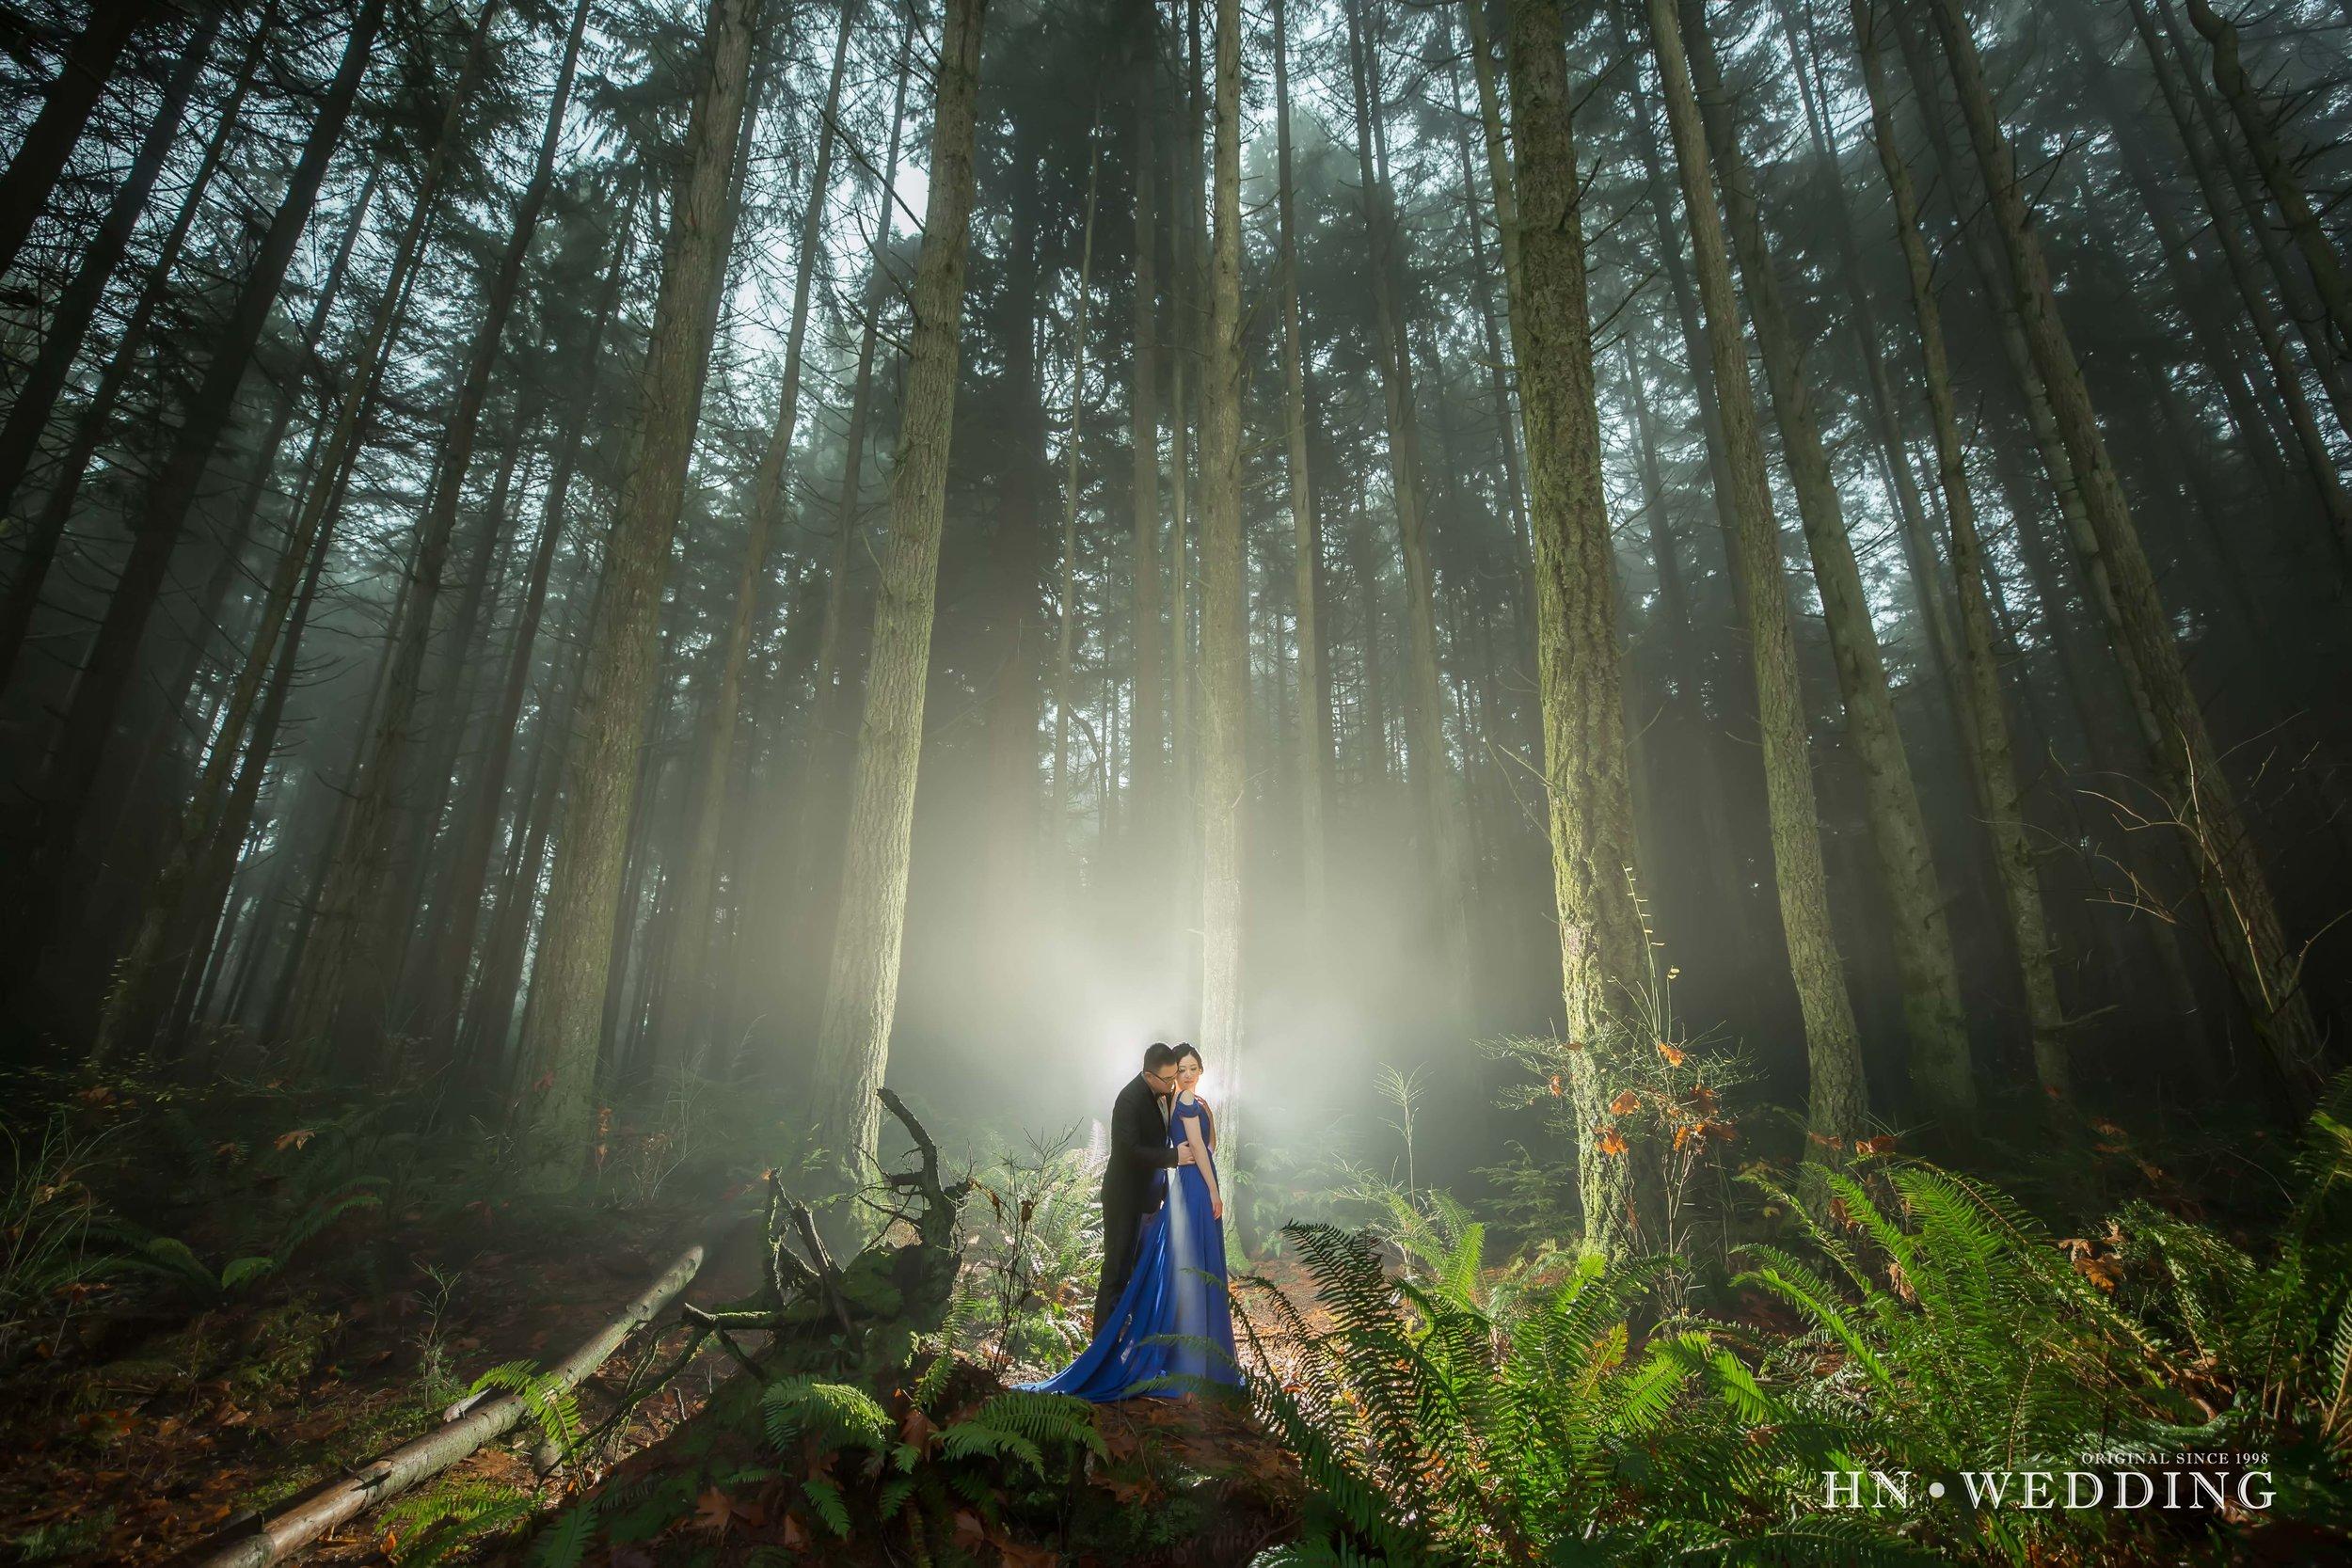 hnwedding20171210prewedding-4211.jpg